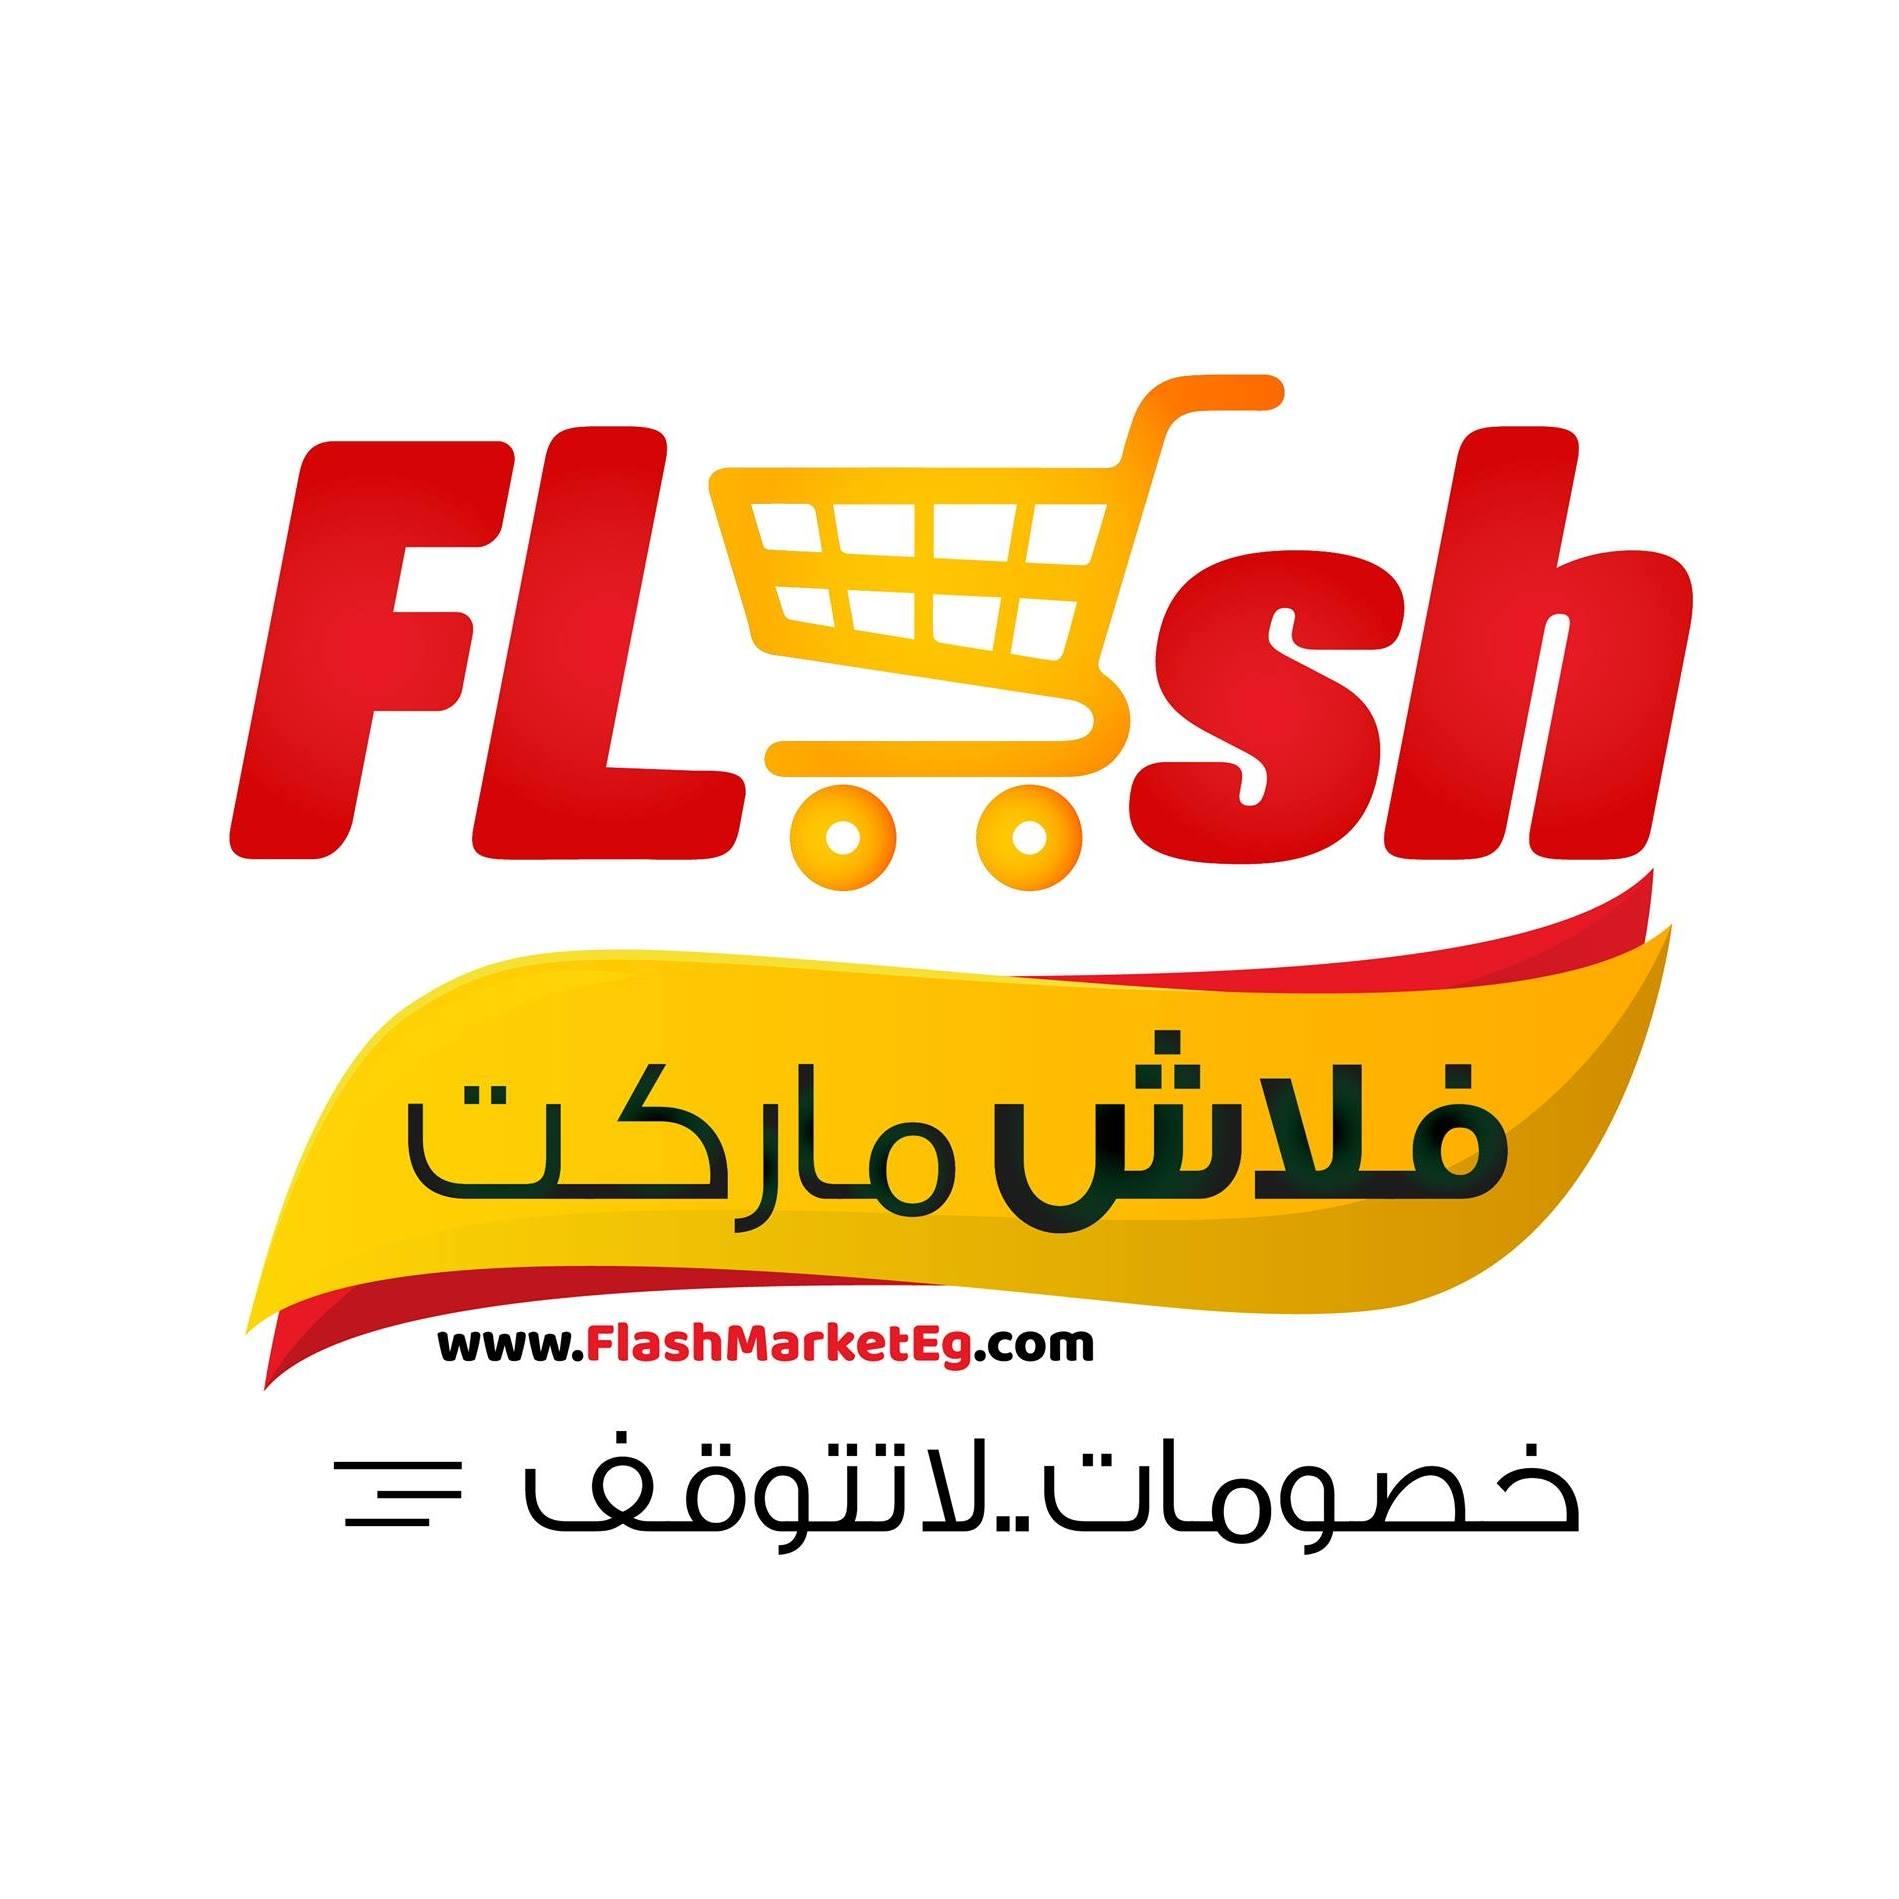 فلاش ماركت Flash Market